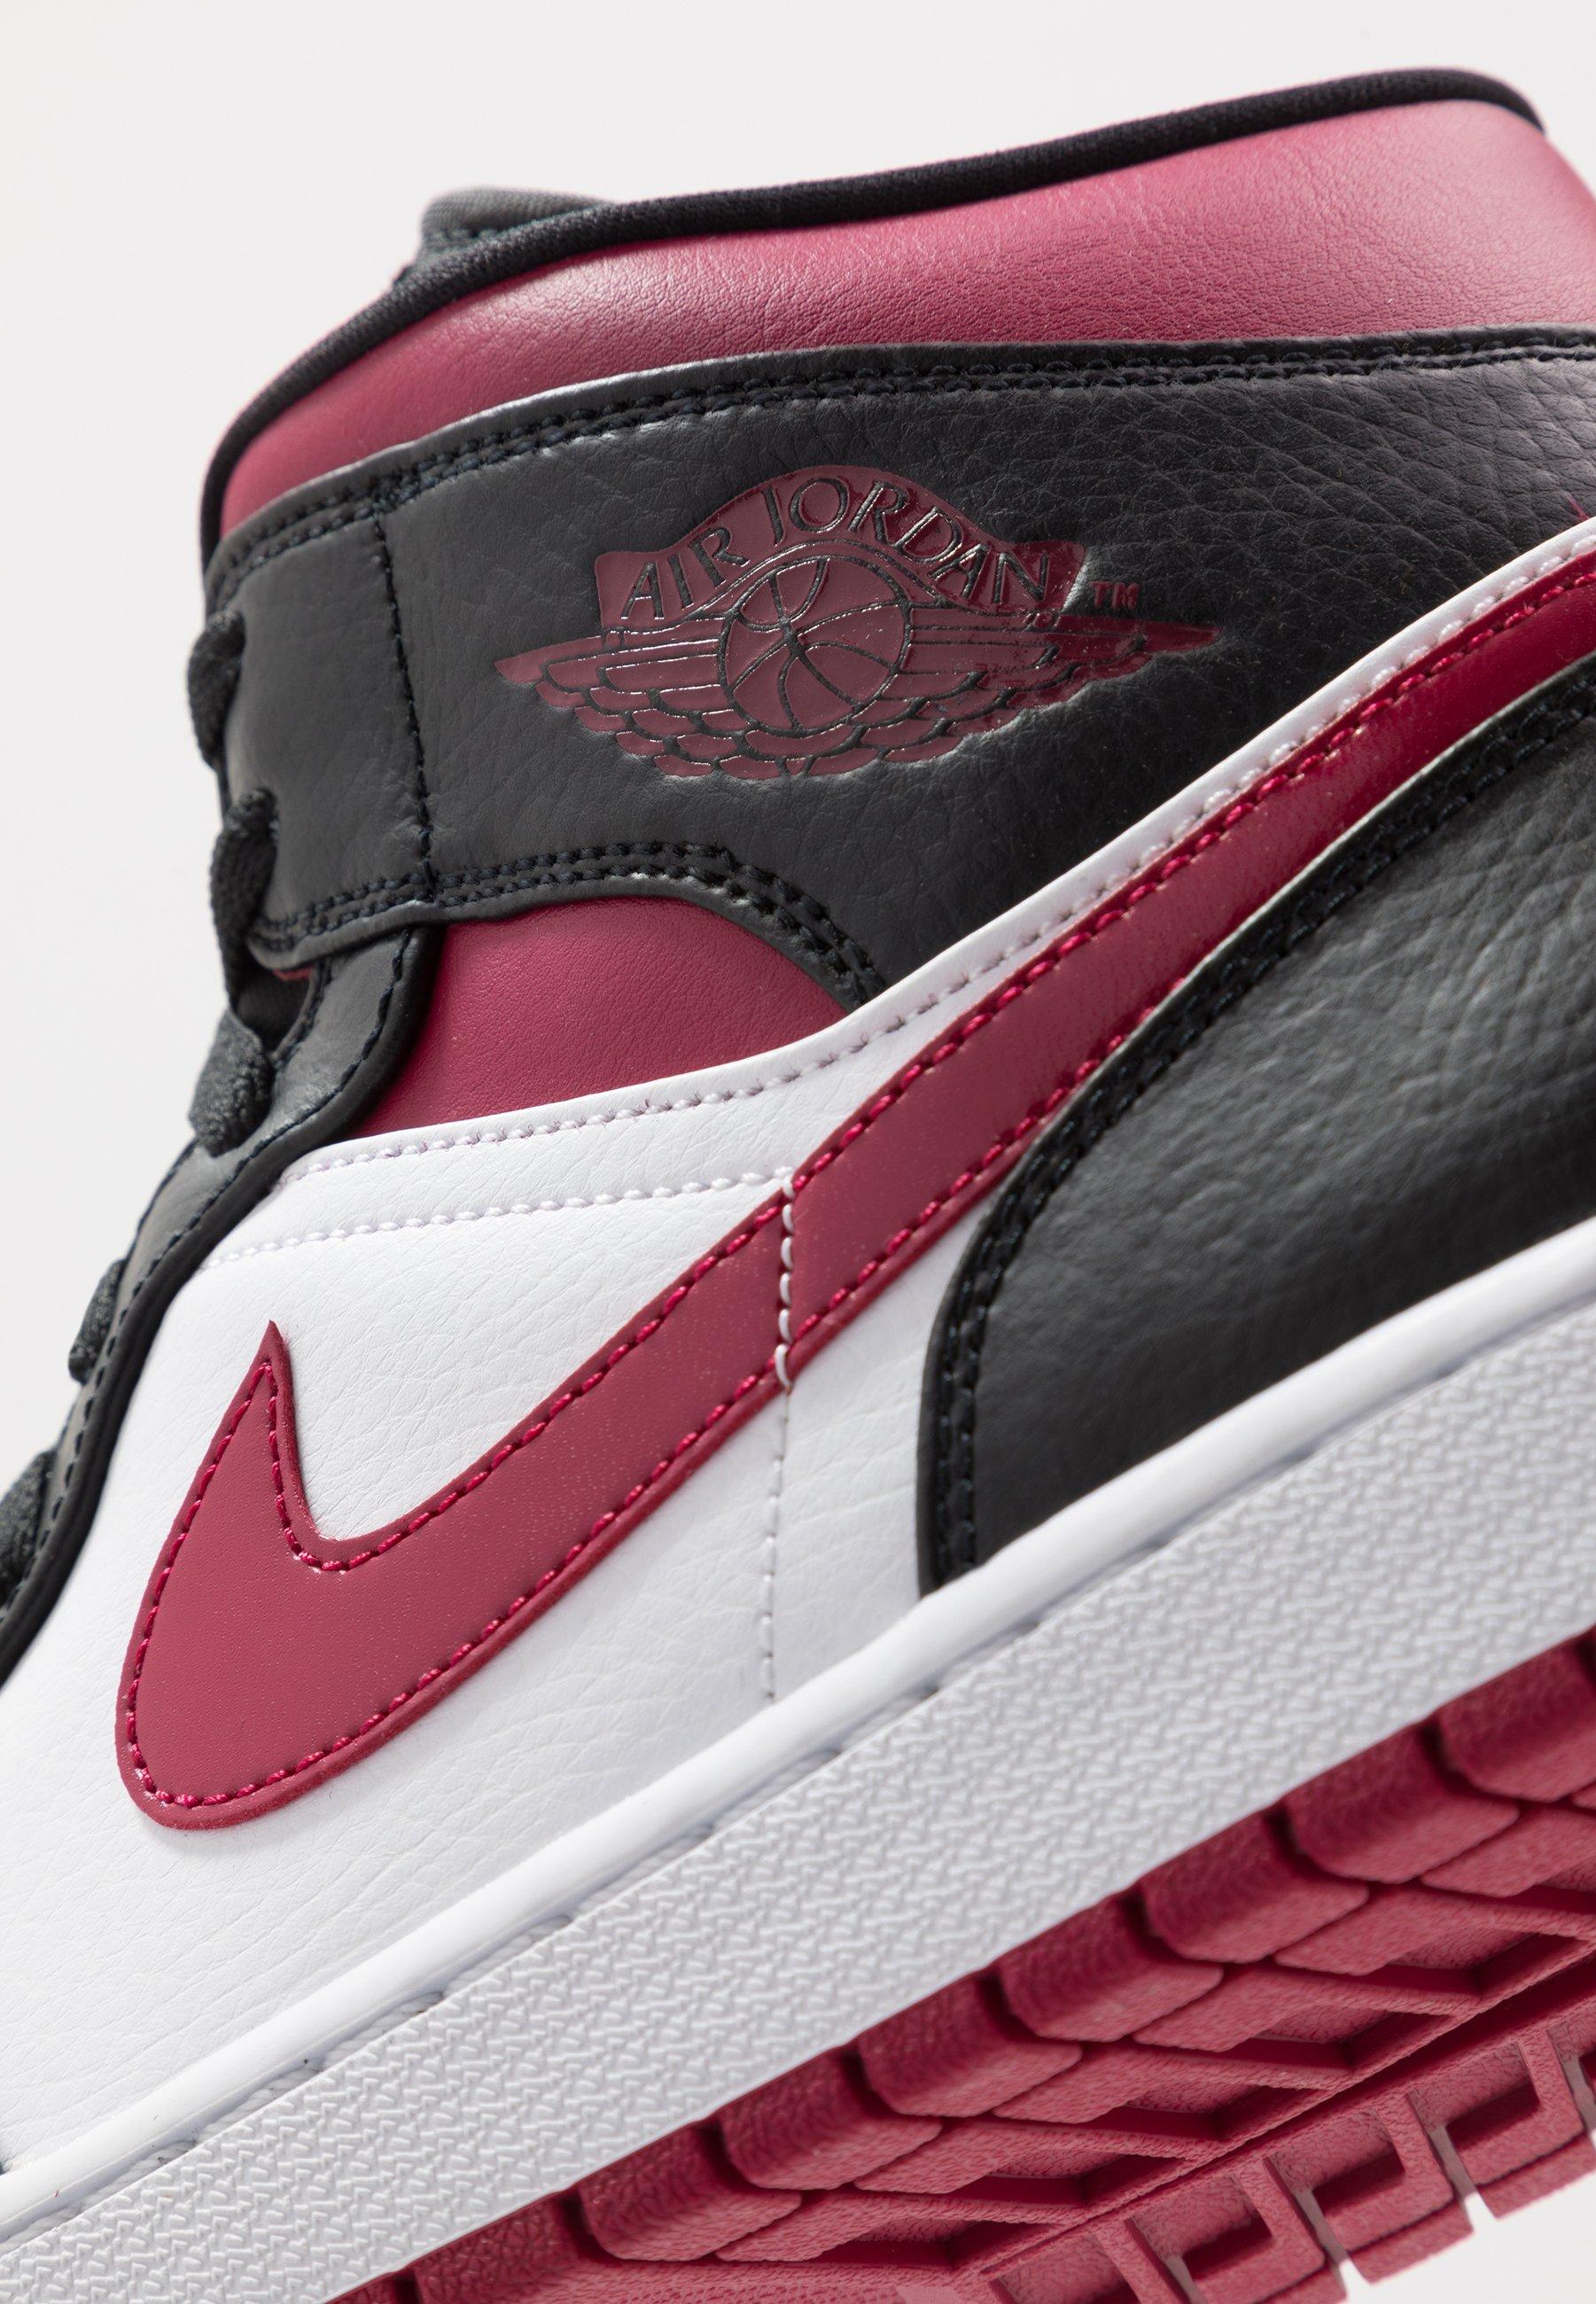 AIR 1 MID Höga sneakers blacknoble redwhite